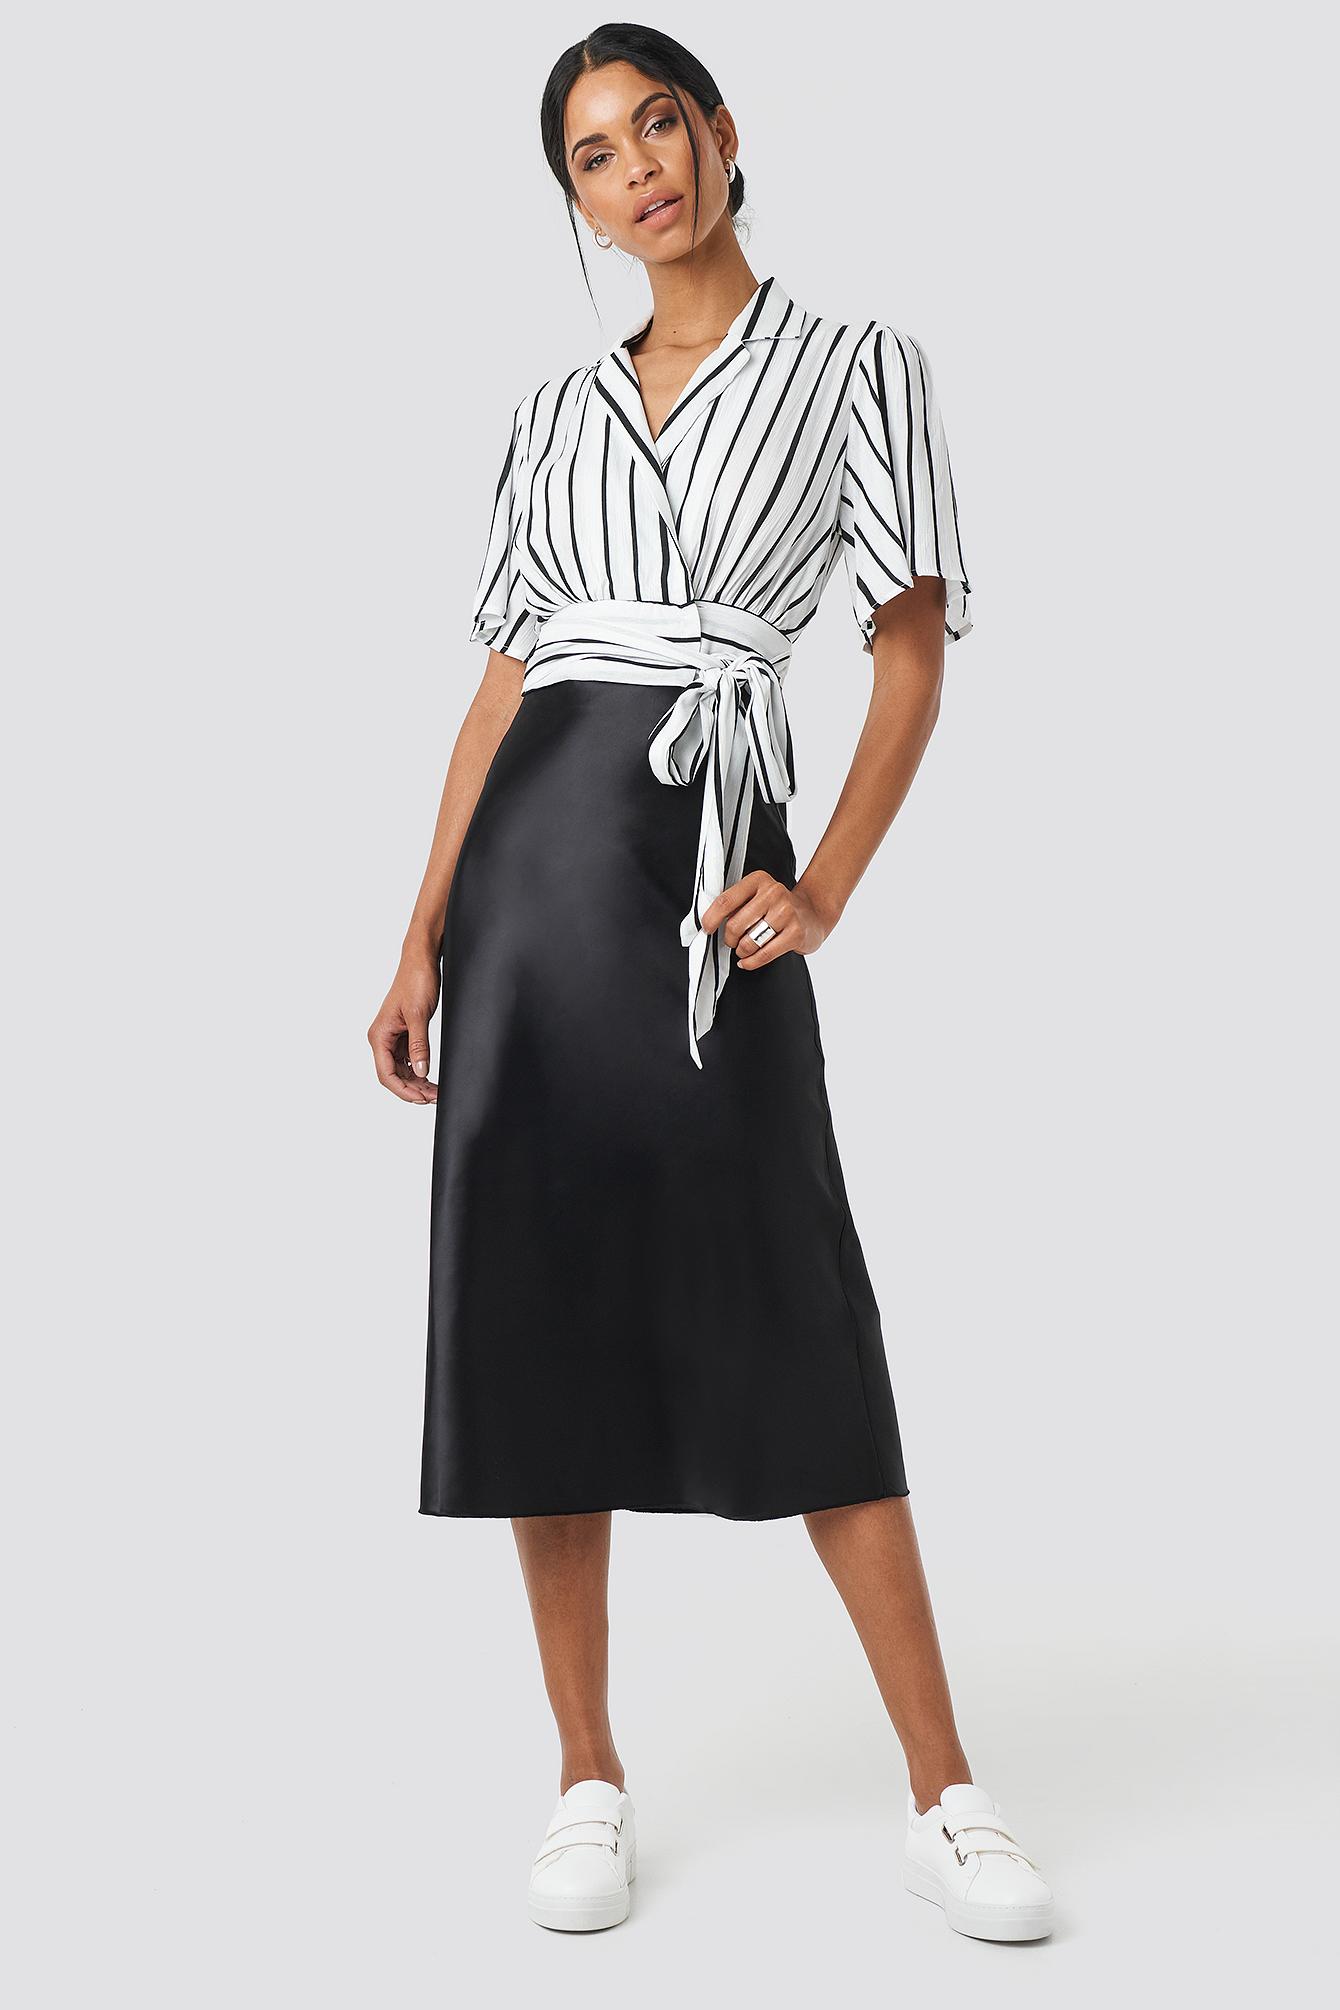 Yol Satin Skirt NA-KD.COM